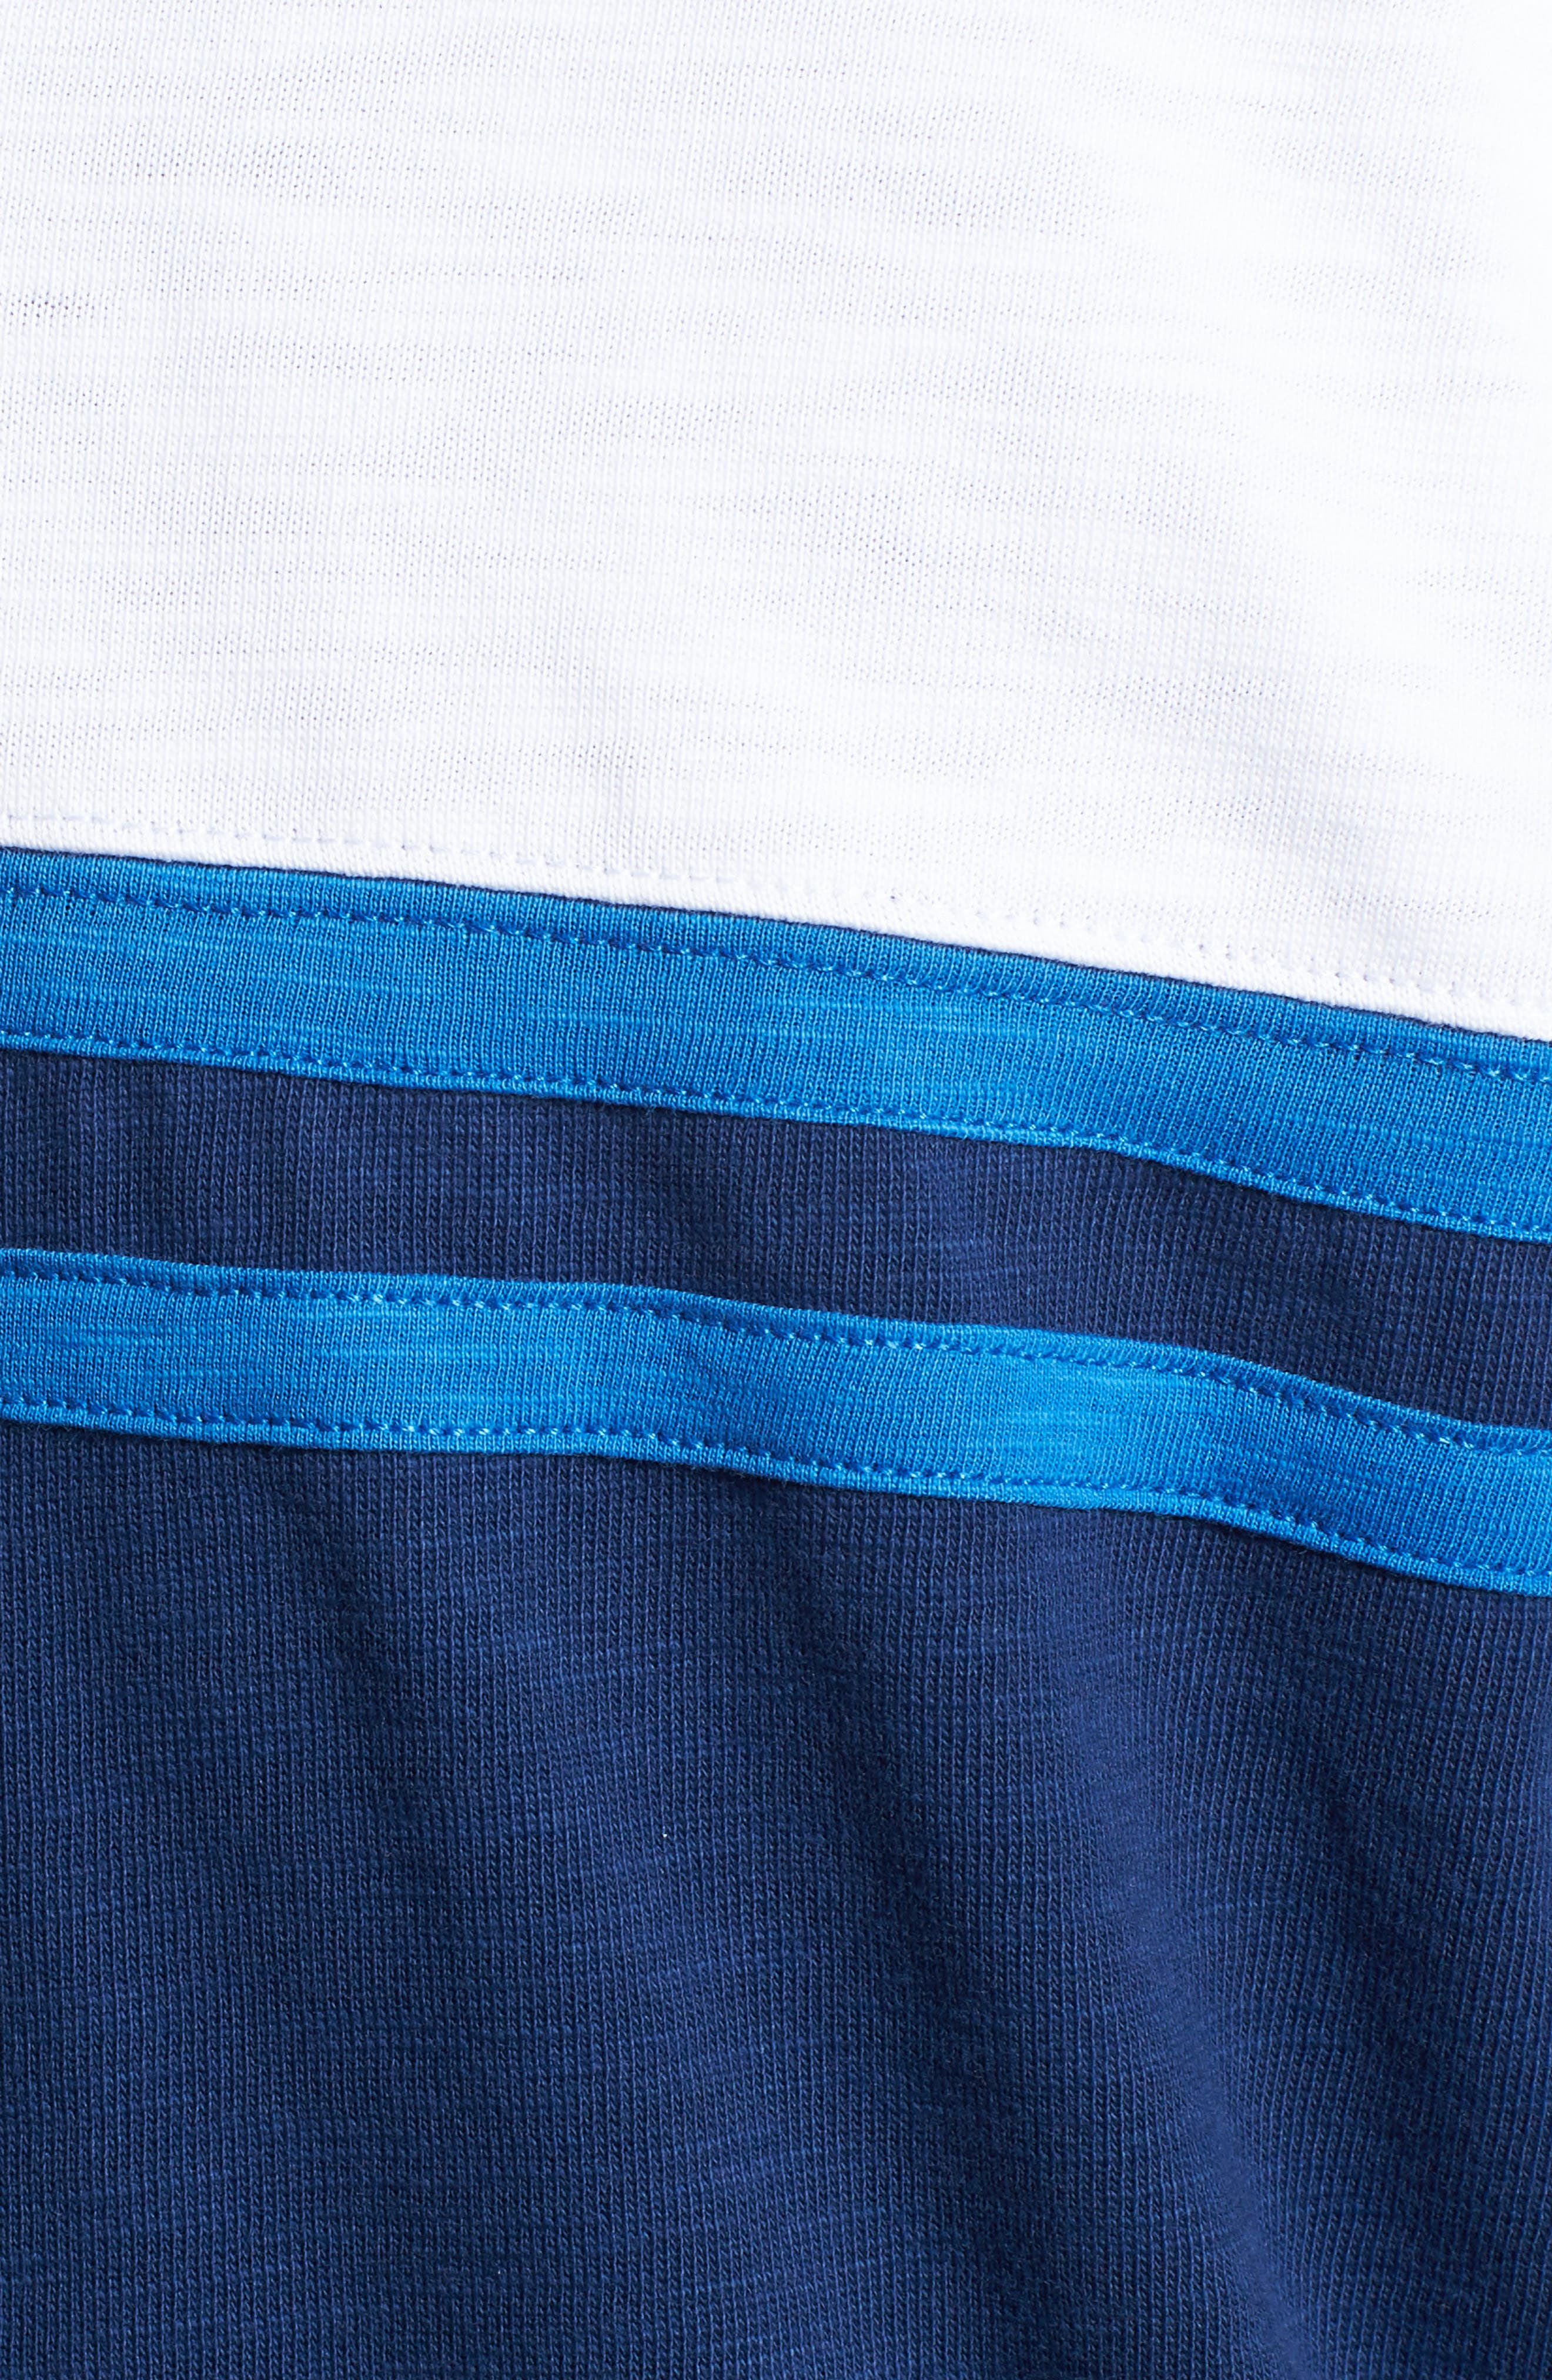 Quarter-Zip Rugby Shirt,                             Alternate thumbnail 5, color,                             401